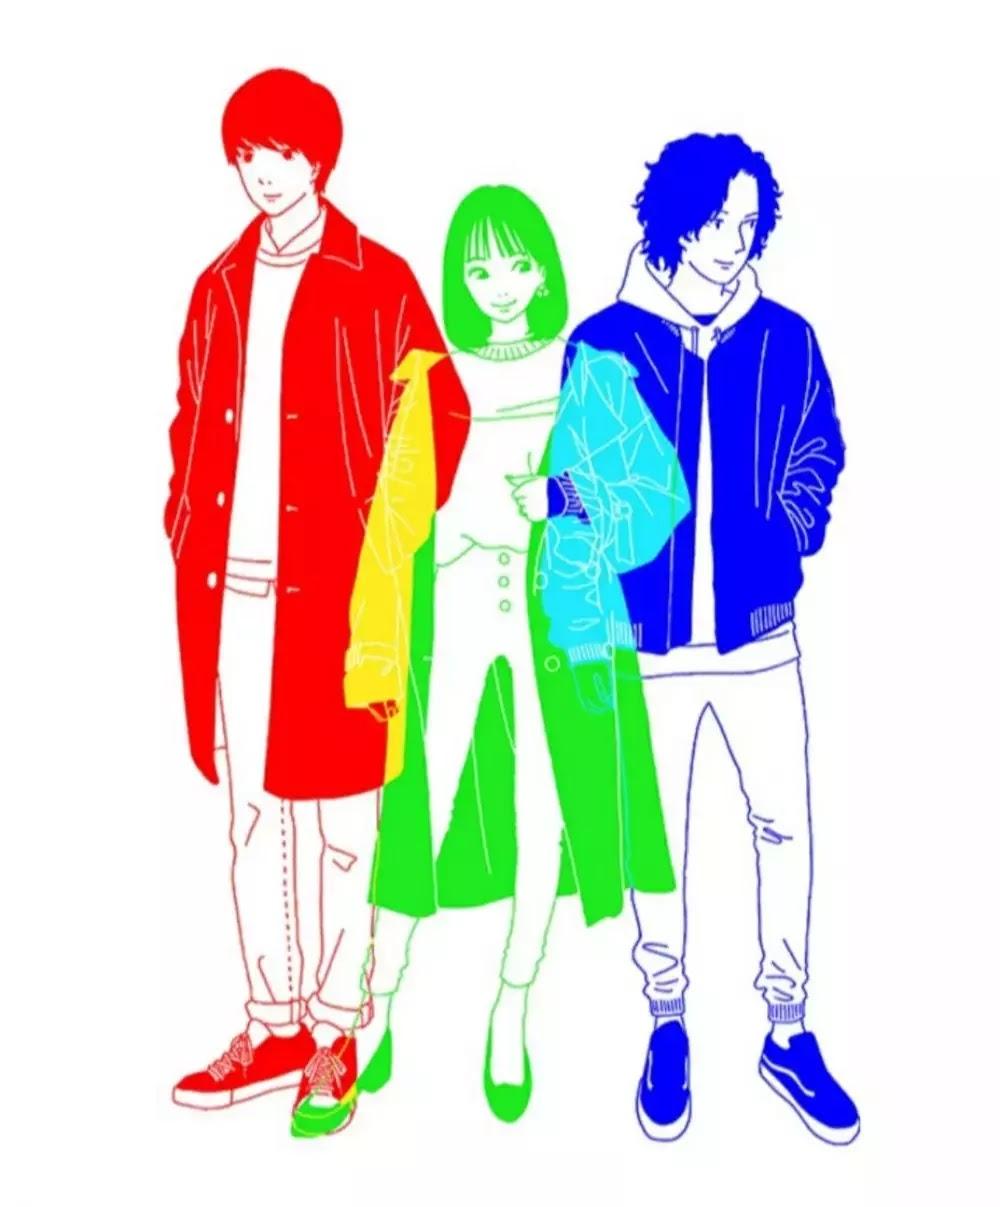 Lirik dan Terjemahan Sangenshoku (Tiga Warna Utama) - Yoasobi